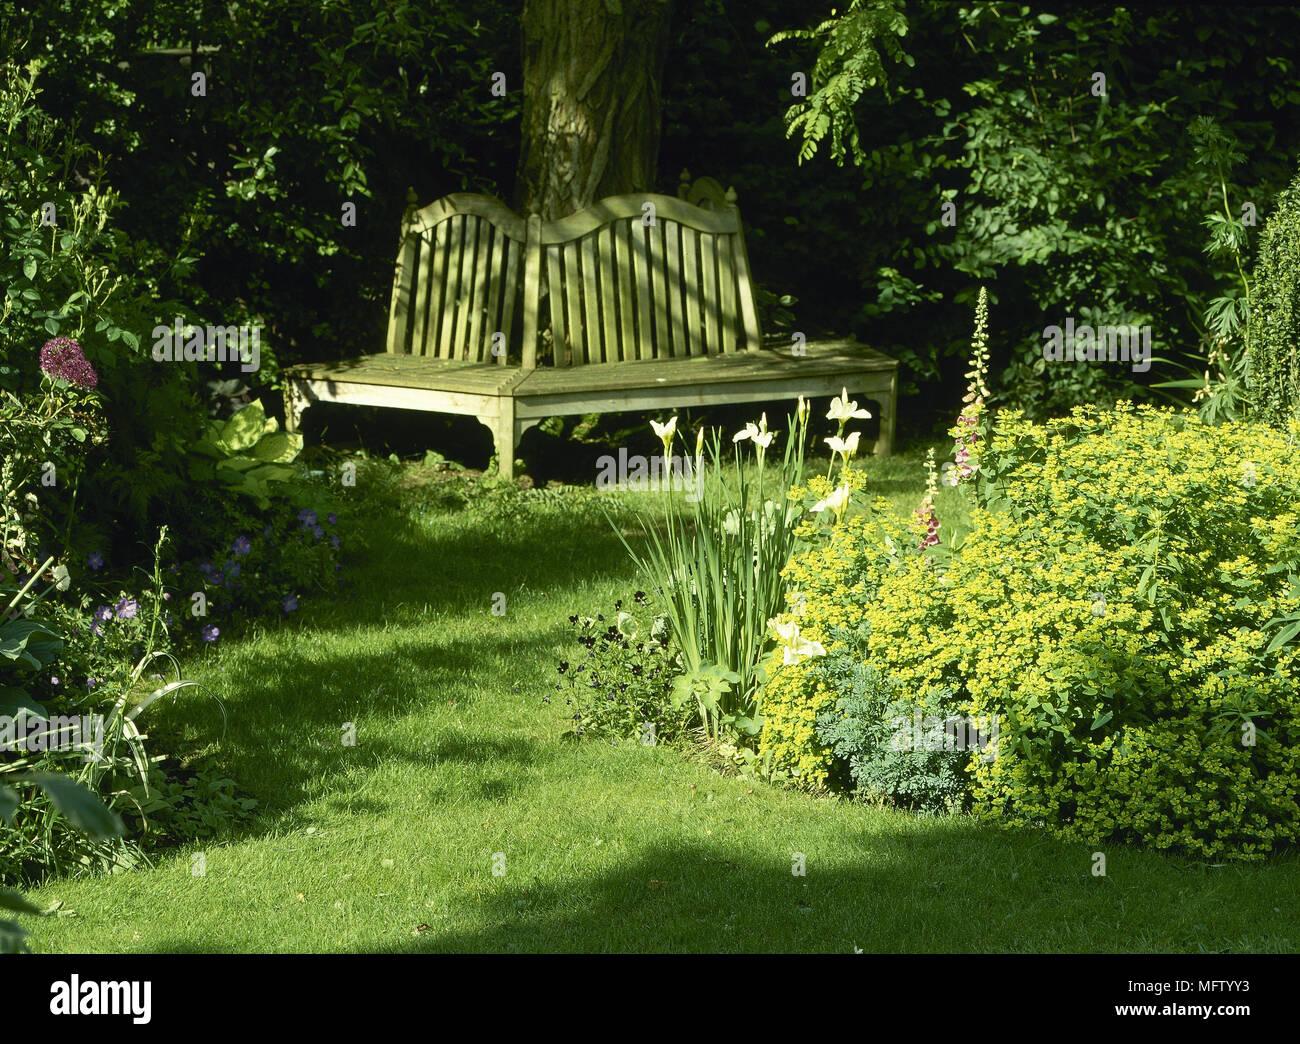 Panchina da giardino intorno tree aiuole dettaglio giardini